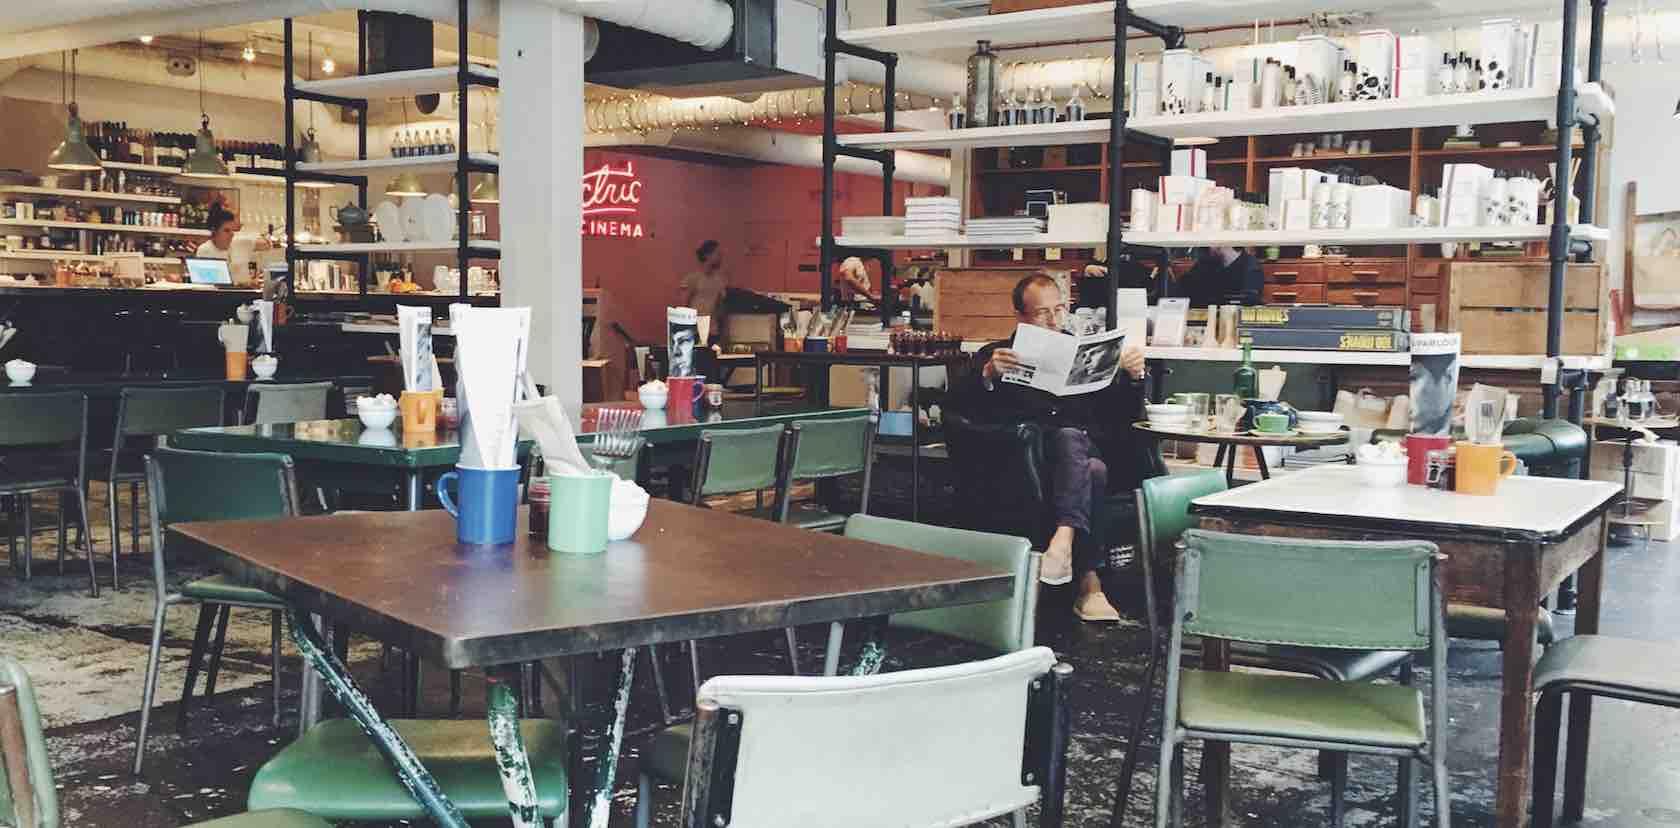 ouvrir un café librairie